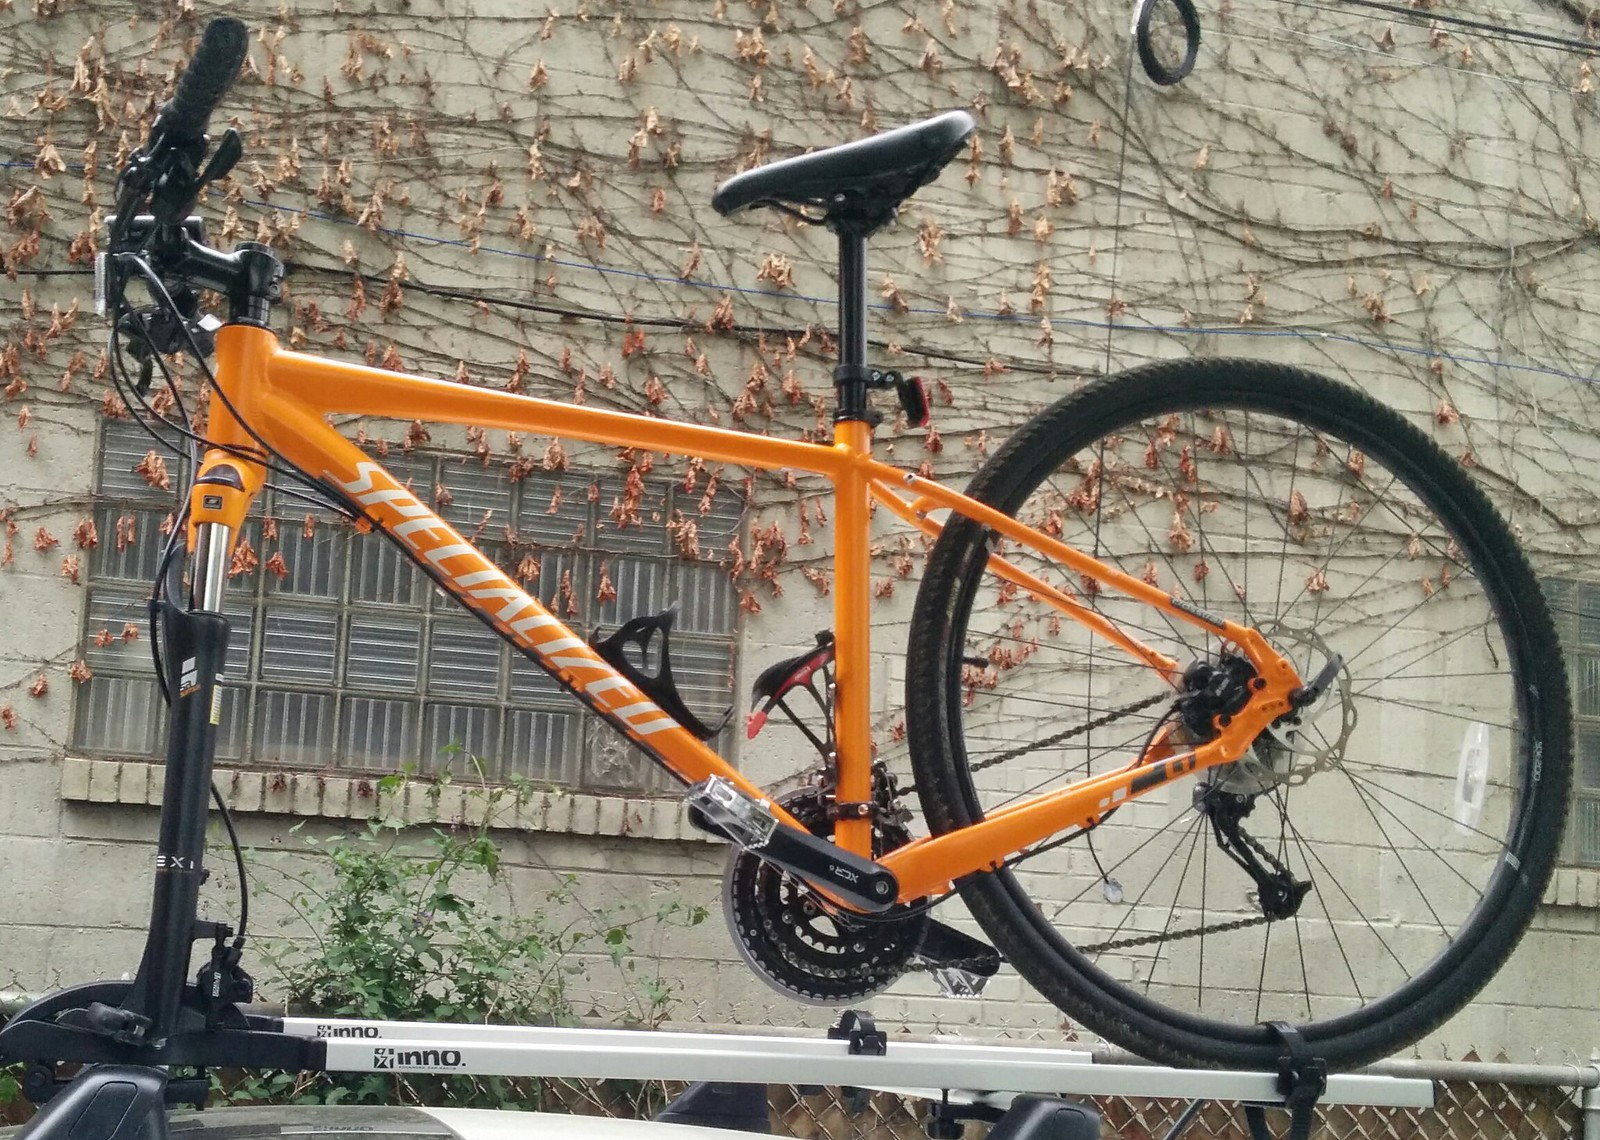 Bikes Stolen In Harrisburg Pa Bike was locked to a railing